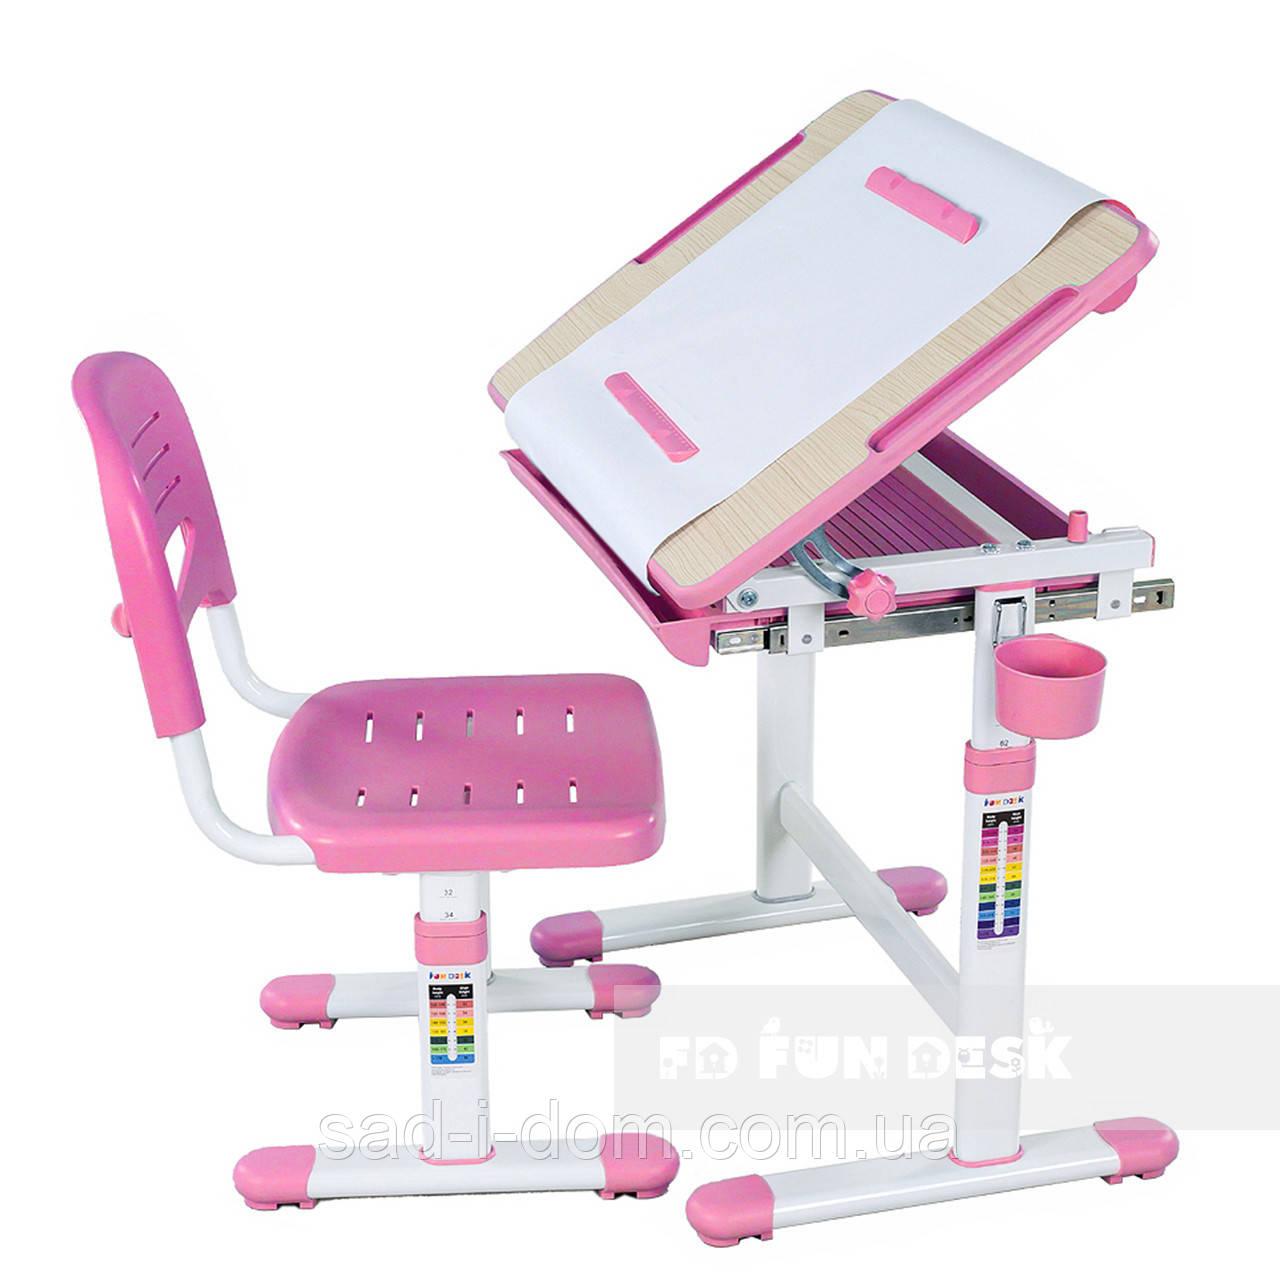 Детская парта-растишка и стул FunDesk Bambino, розовый